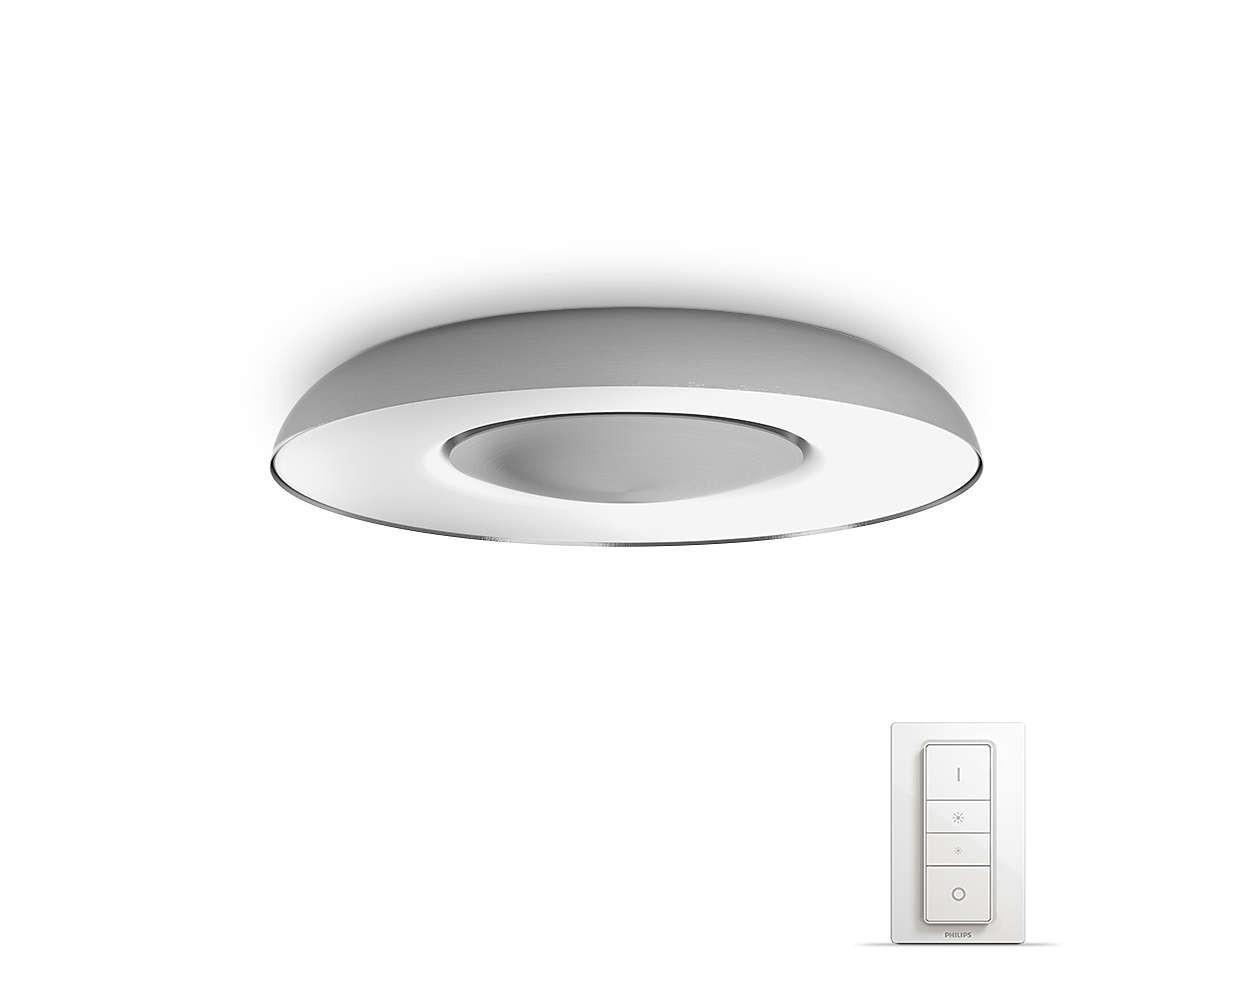 Philips Hue Still LED Deckenleuchte 2400lm inkl. Dimmschalter - Silber